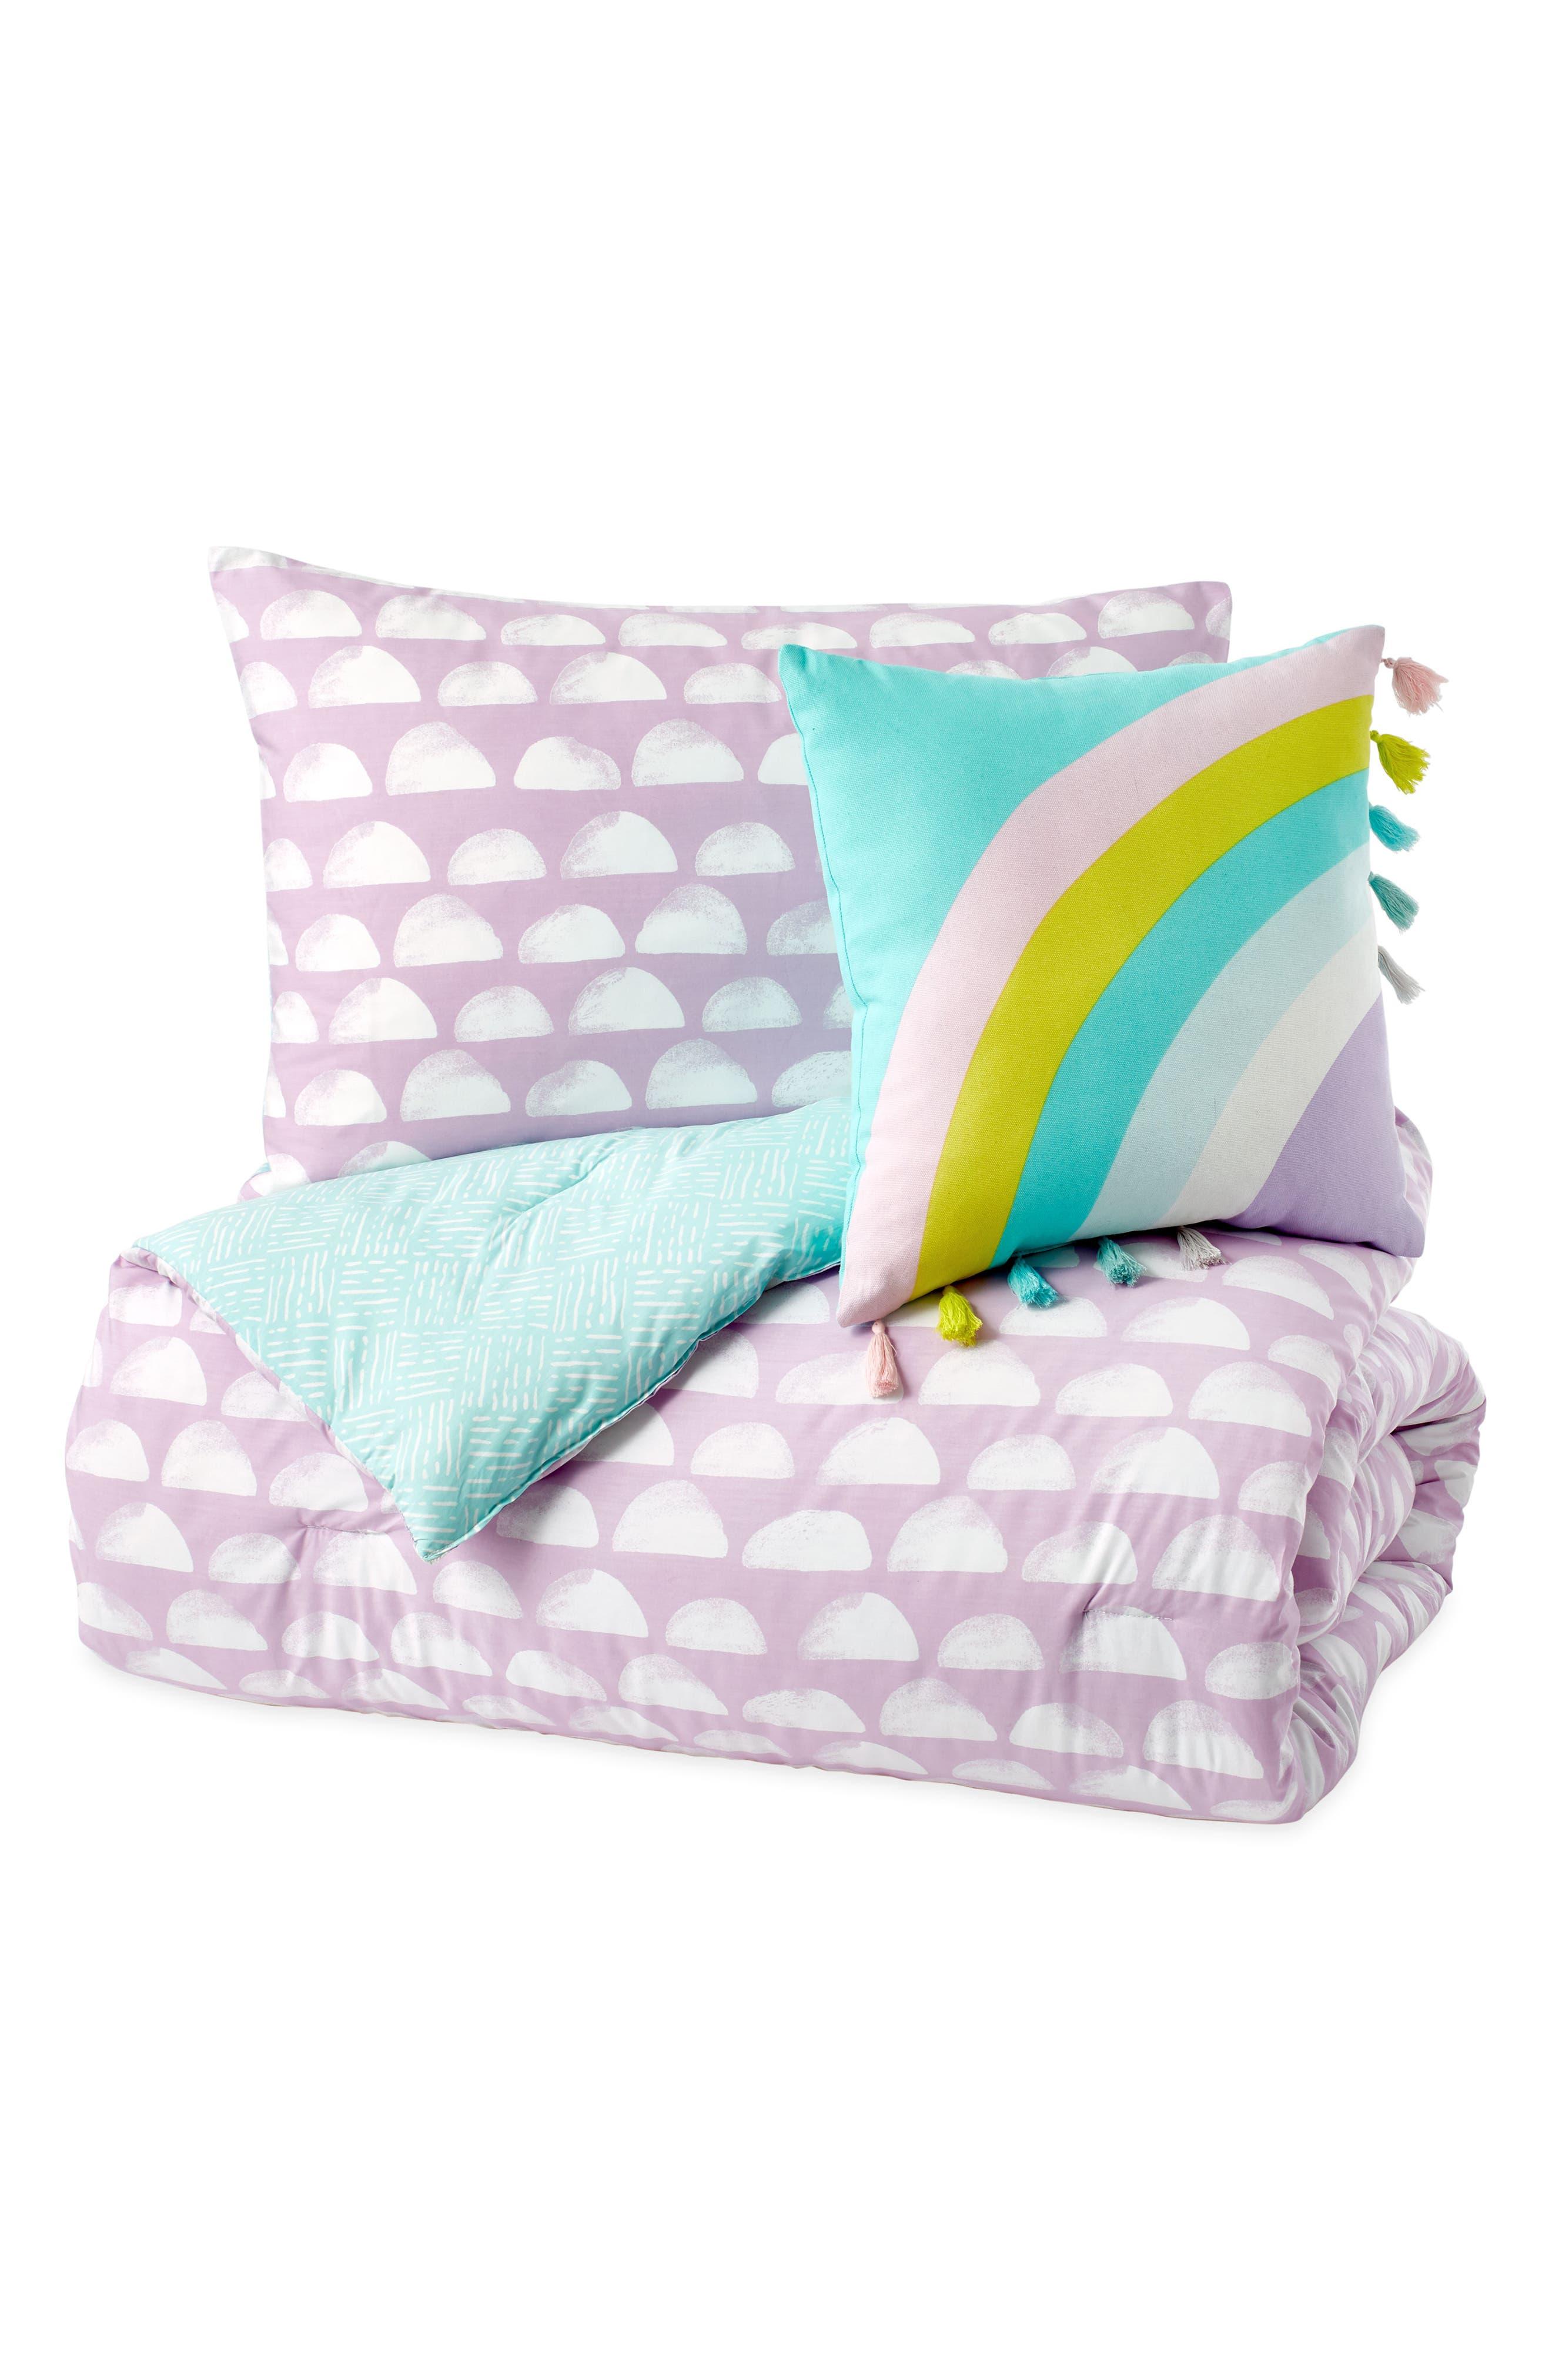 DKNY, Over the Moon Comforter, Sham & Accent Pillow Set, Alternate thumbnail 3, color, PURPLE